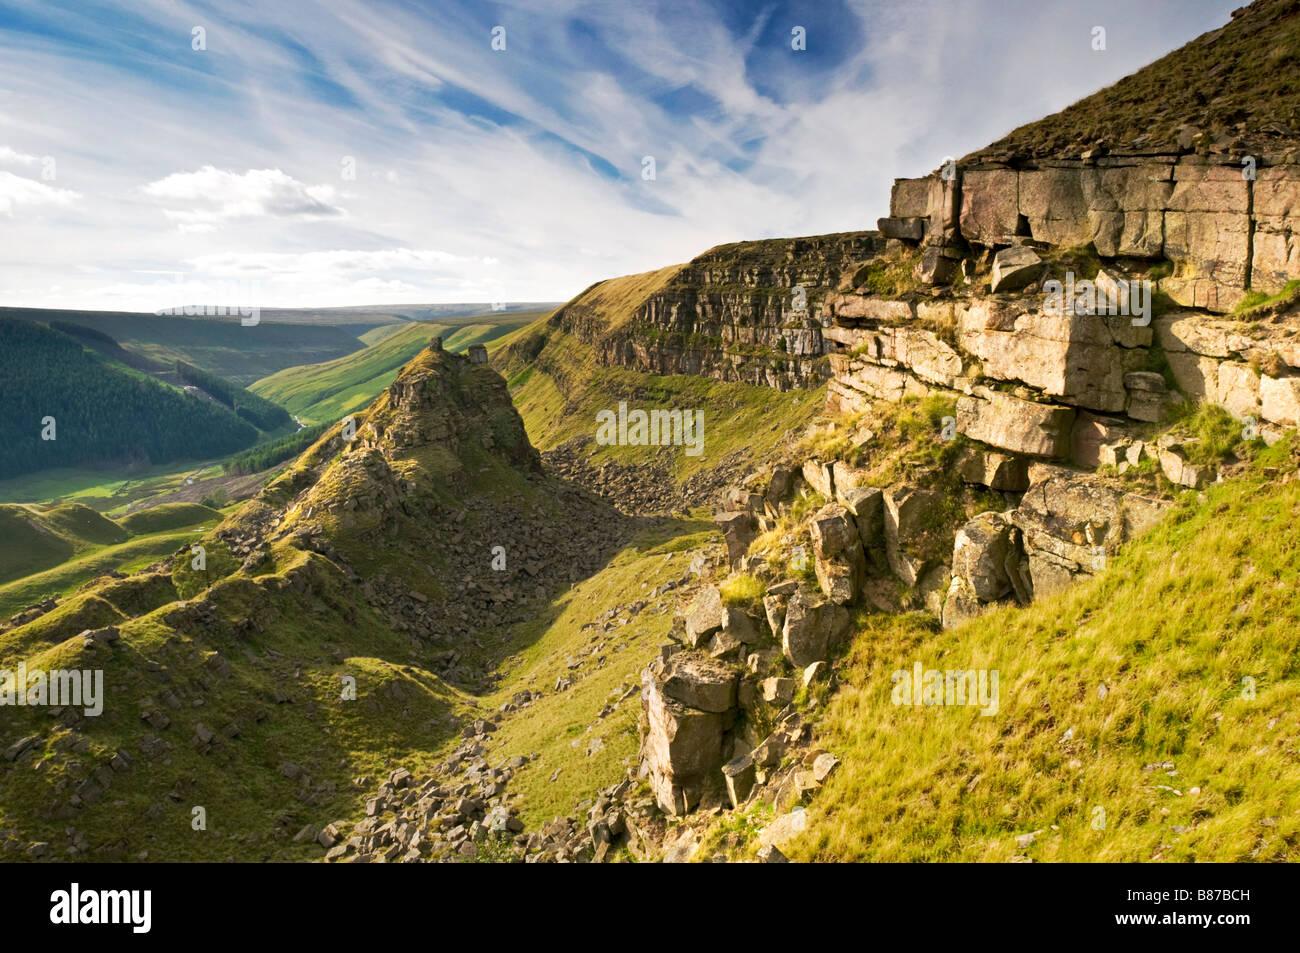 The Tower & Alport Castles, Alport Dale, Peak District National Park, Derbyshire, England, UK - Stock Image